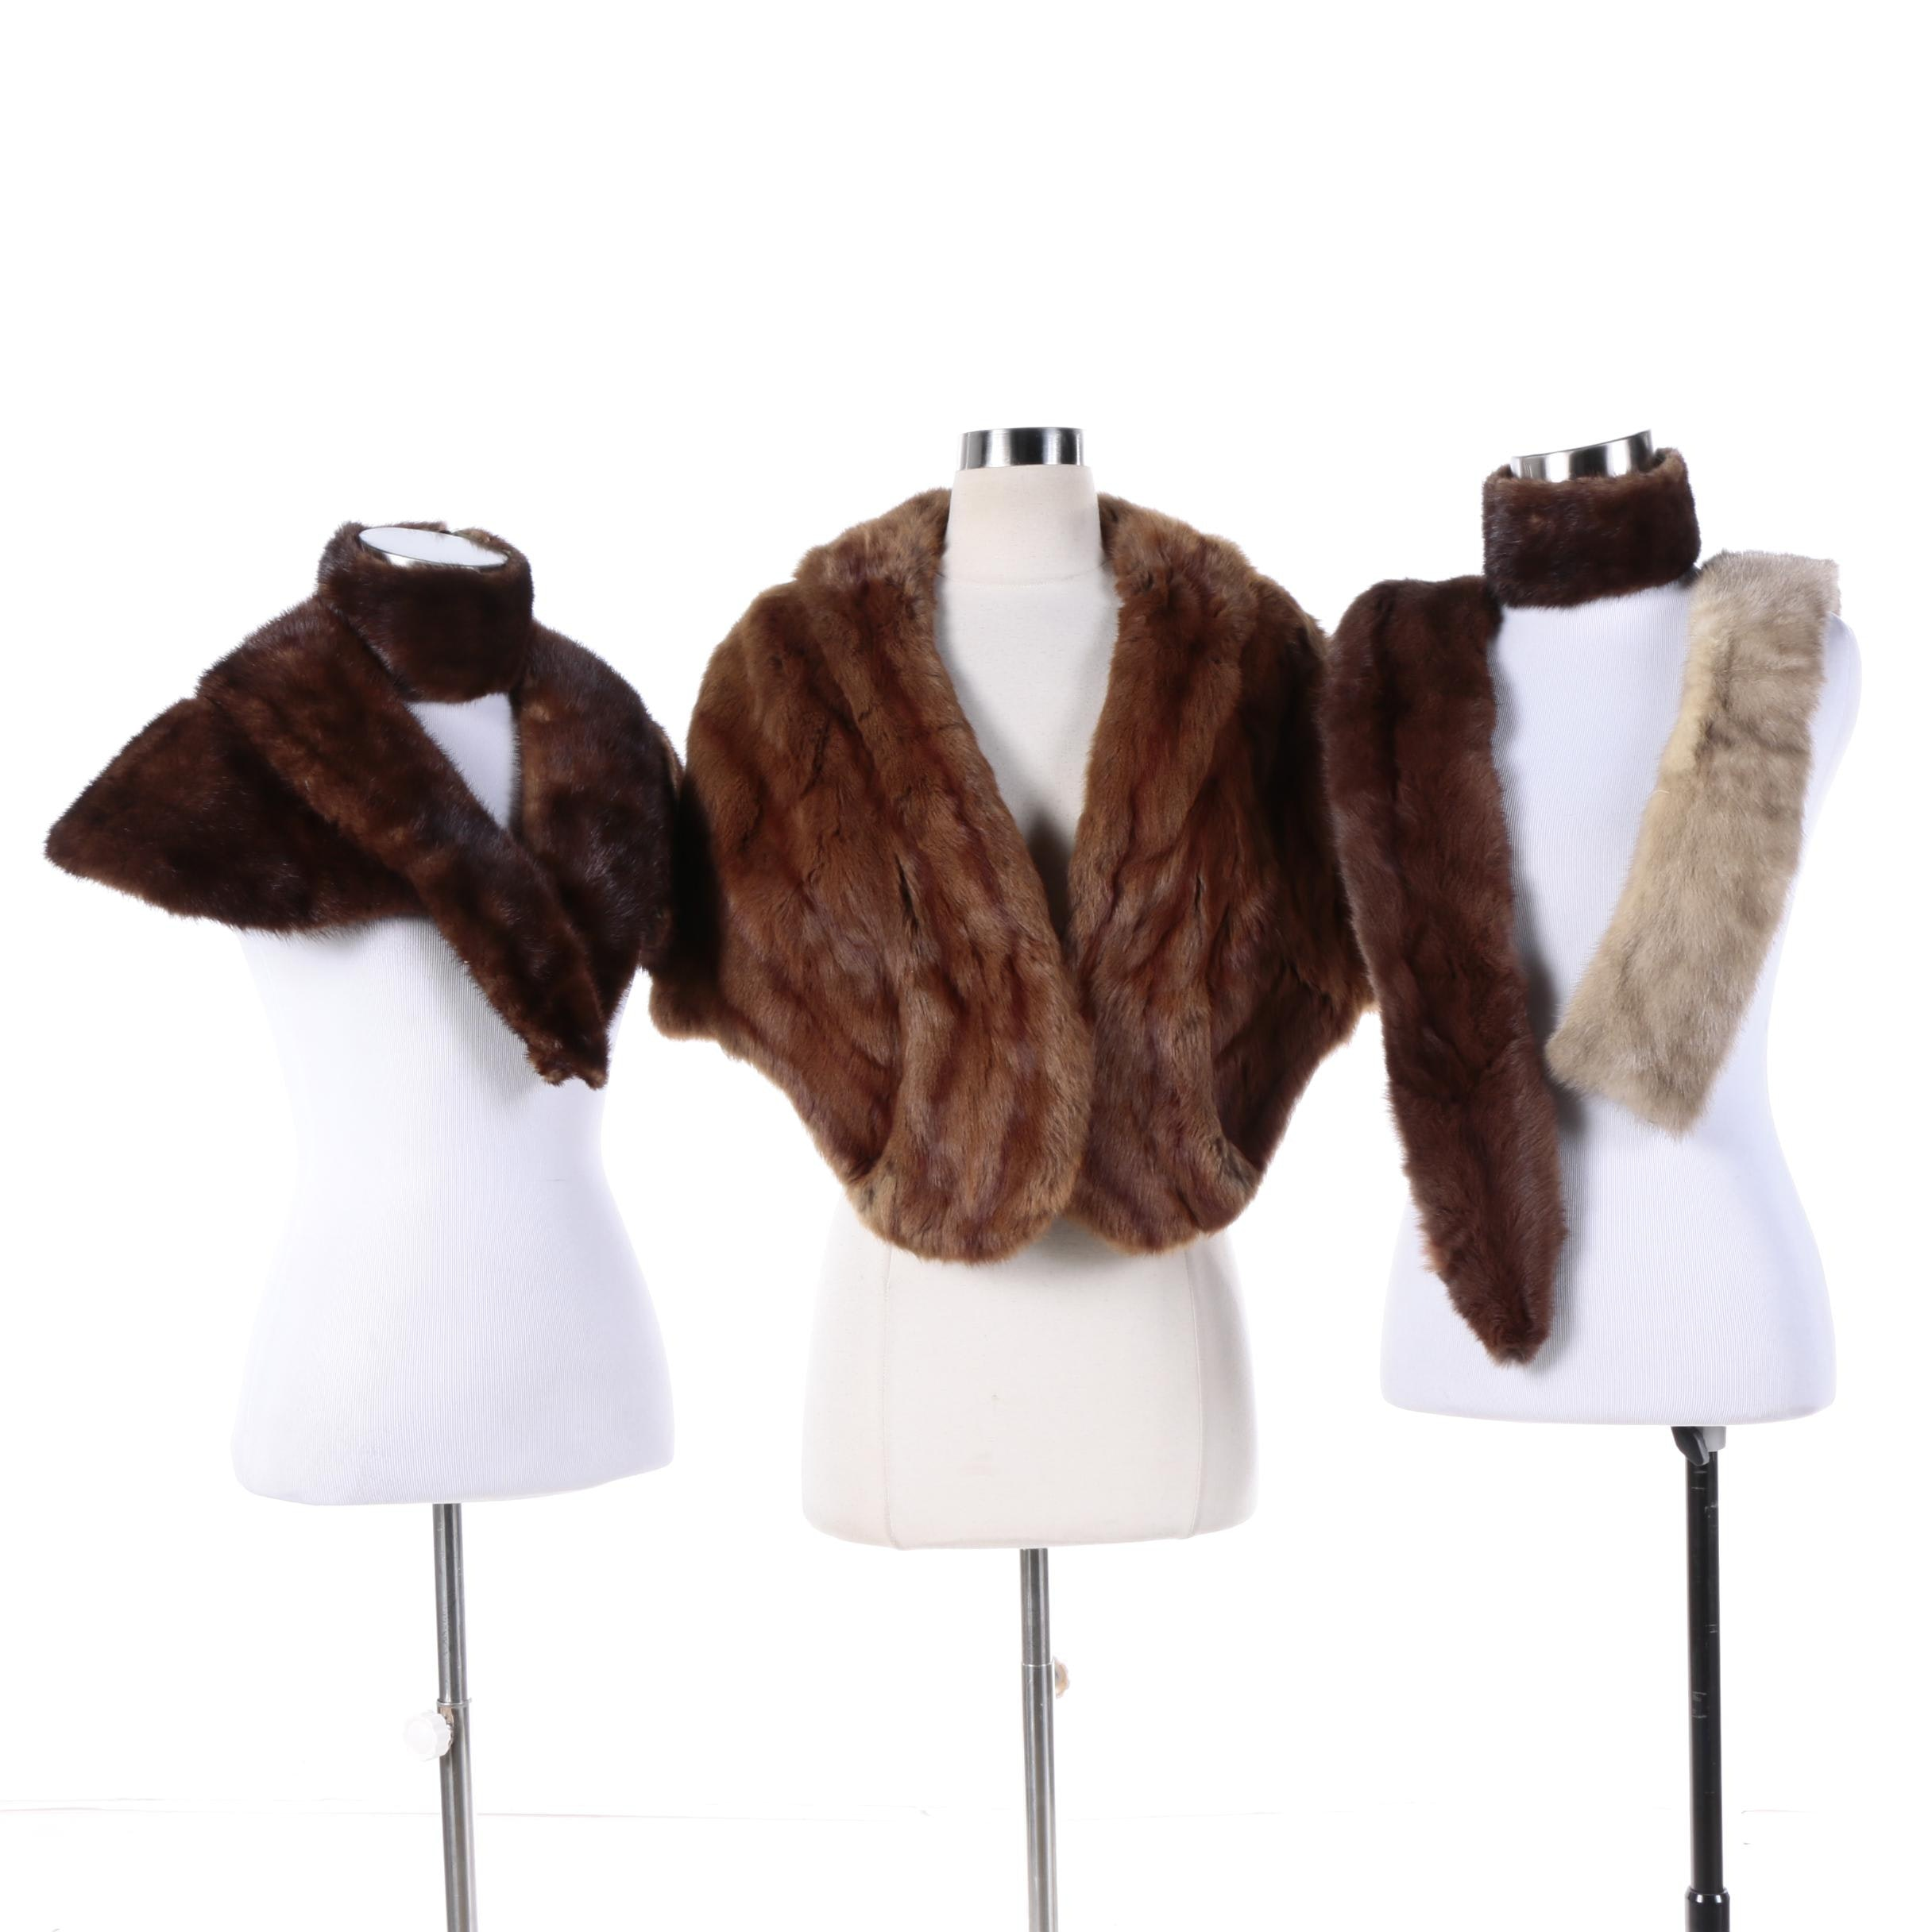 Squirrel, Marten and Mink Fur Stoles, Collars and Cuffs